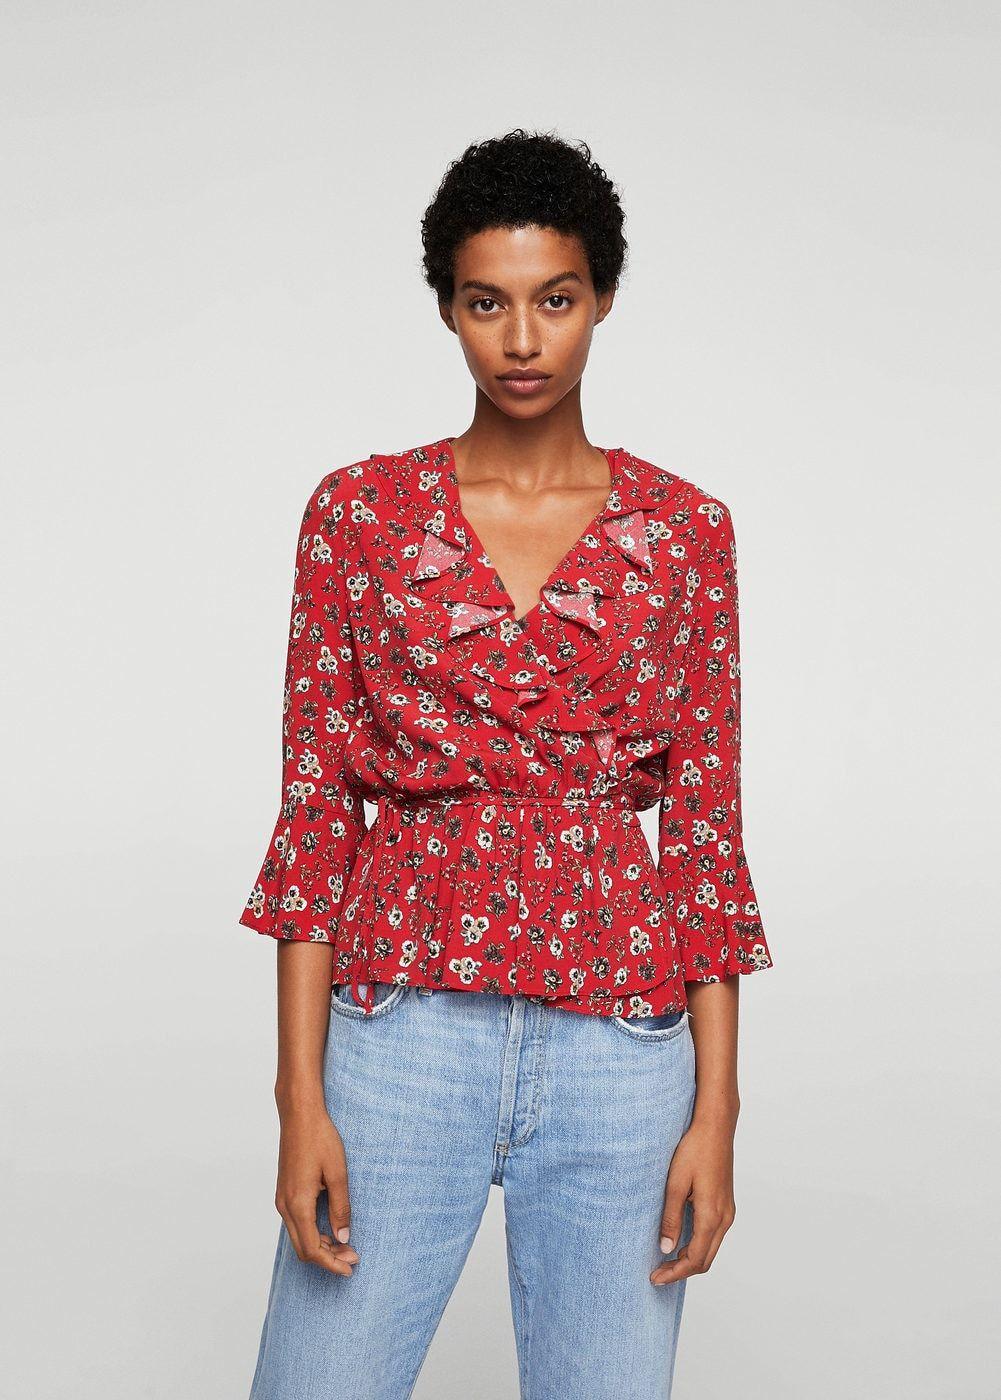 a9aa70583deb24 Fırfırlı çiçekli bluz - Kadın